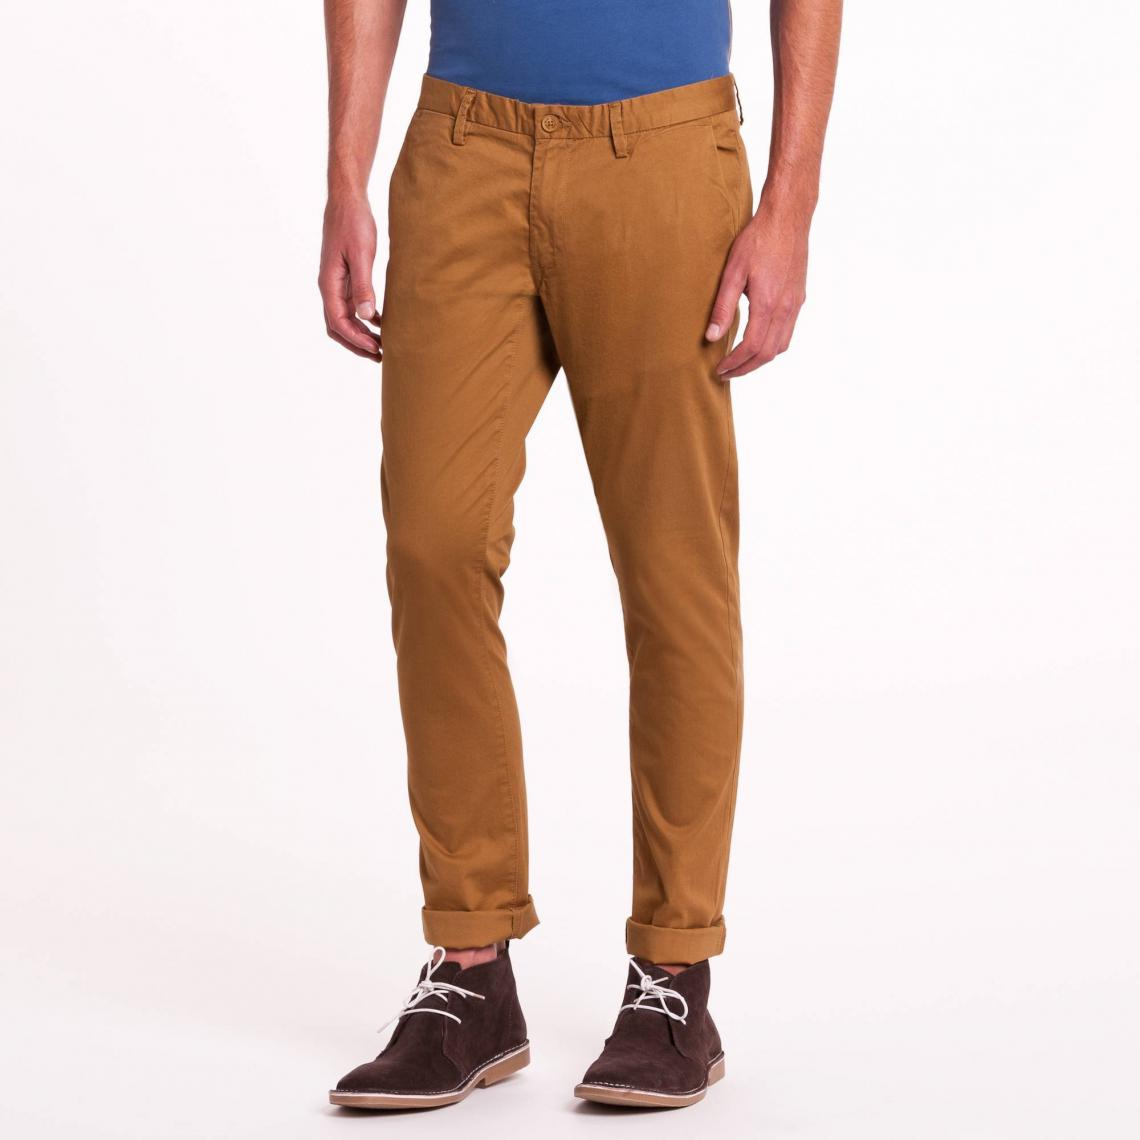 nouveau style dcf2e 0acb7 Pantalon chino slim camel Teddy Smith | 3 SUISSES